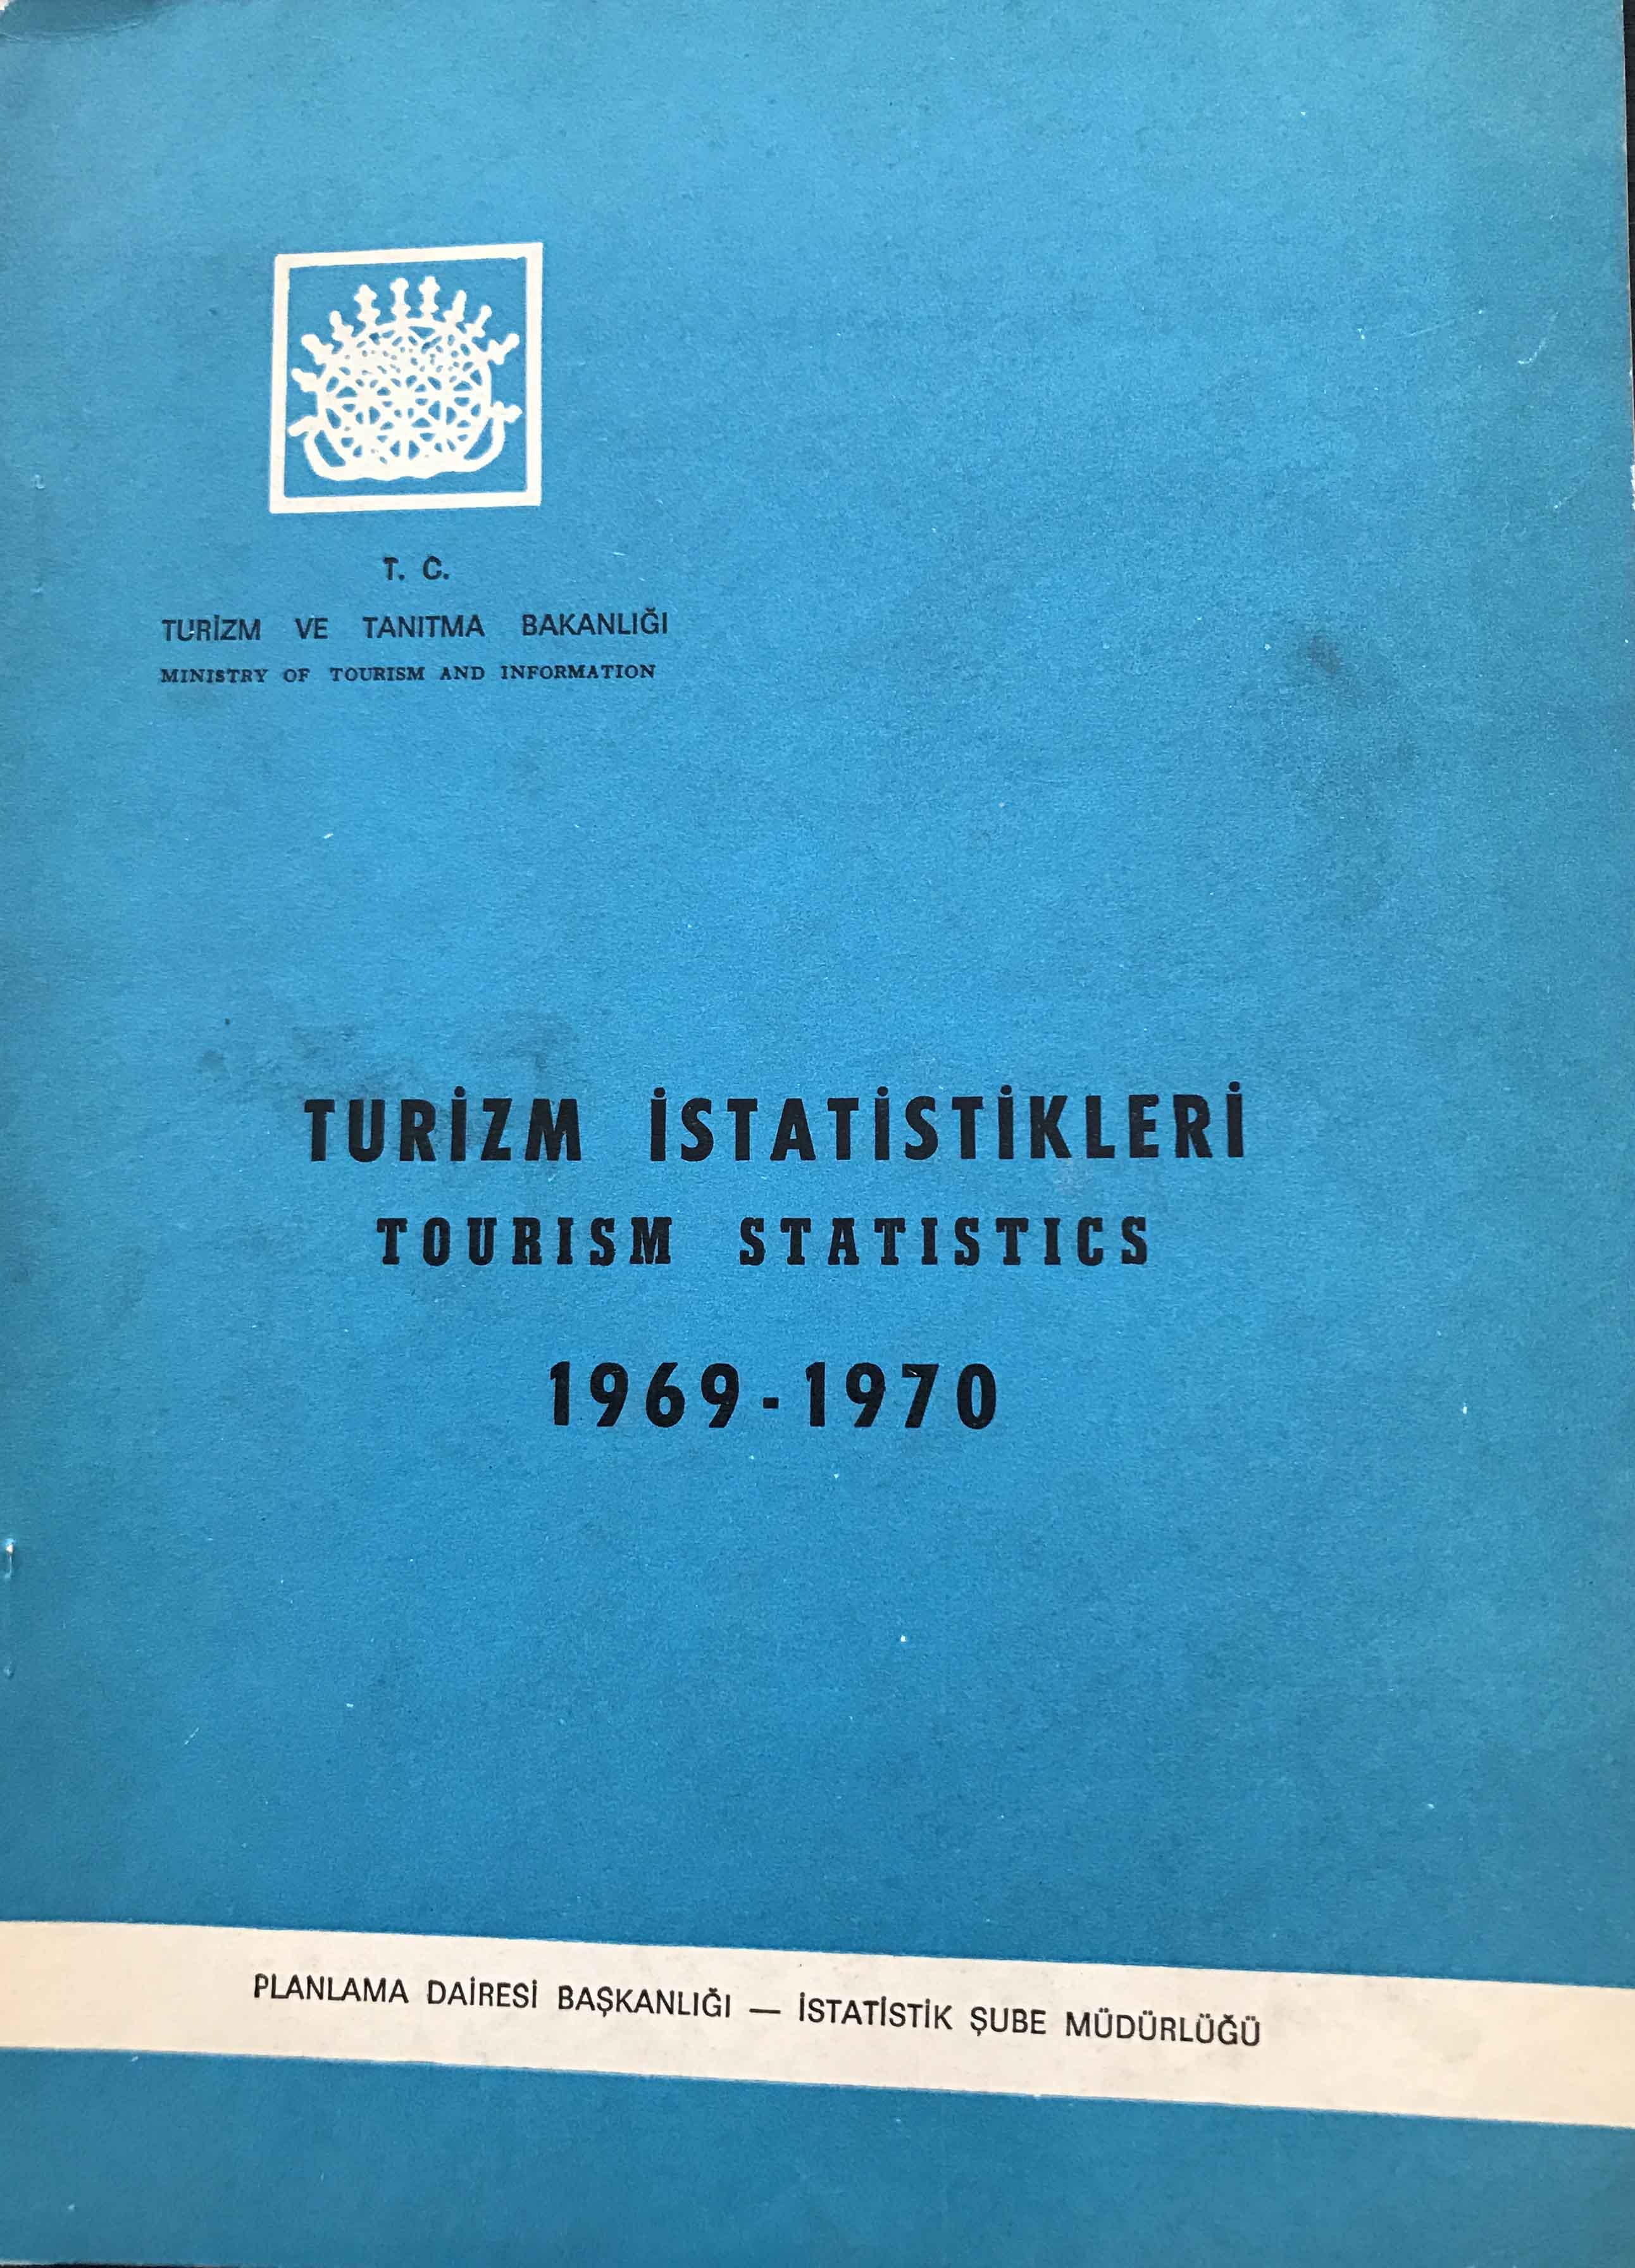 Turizm İstatistikleri 1969-1970 Kitap Kapağı